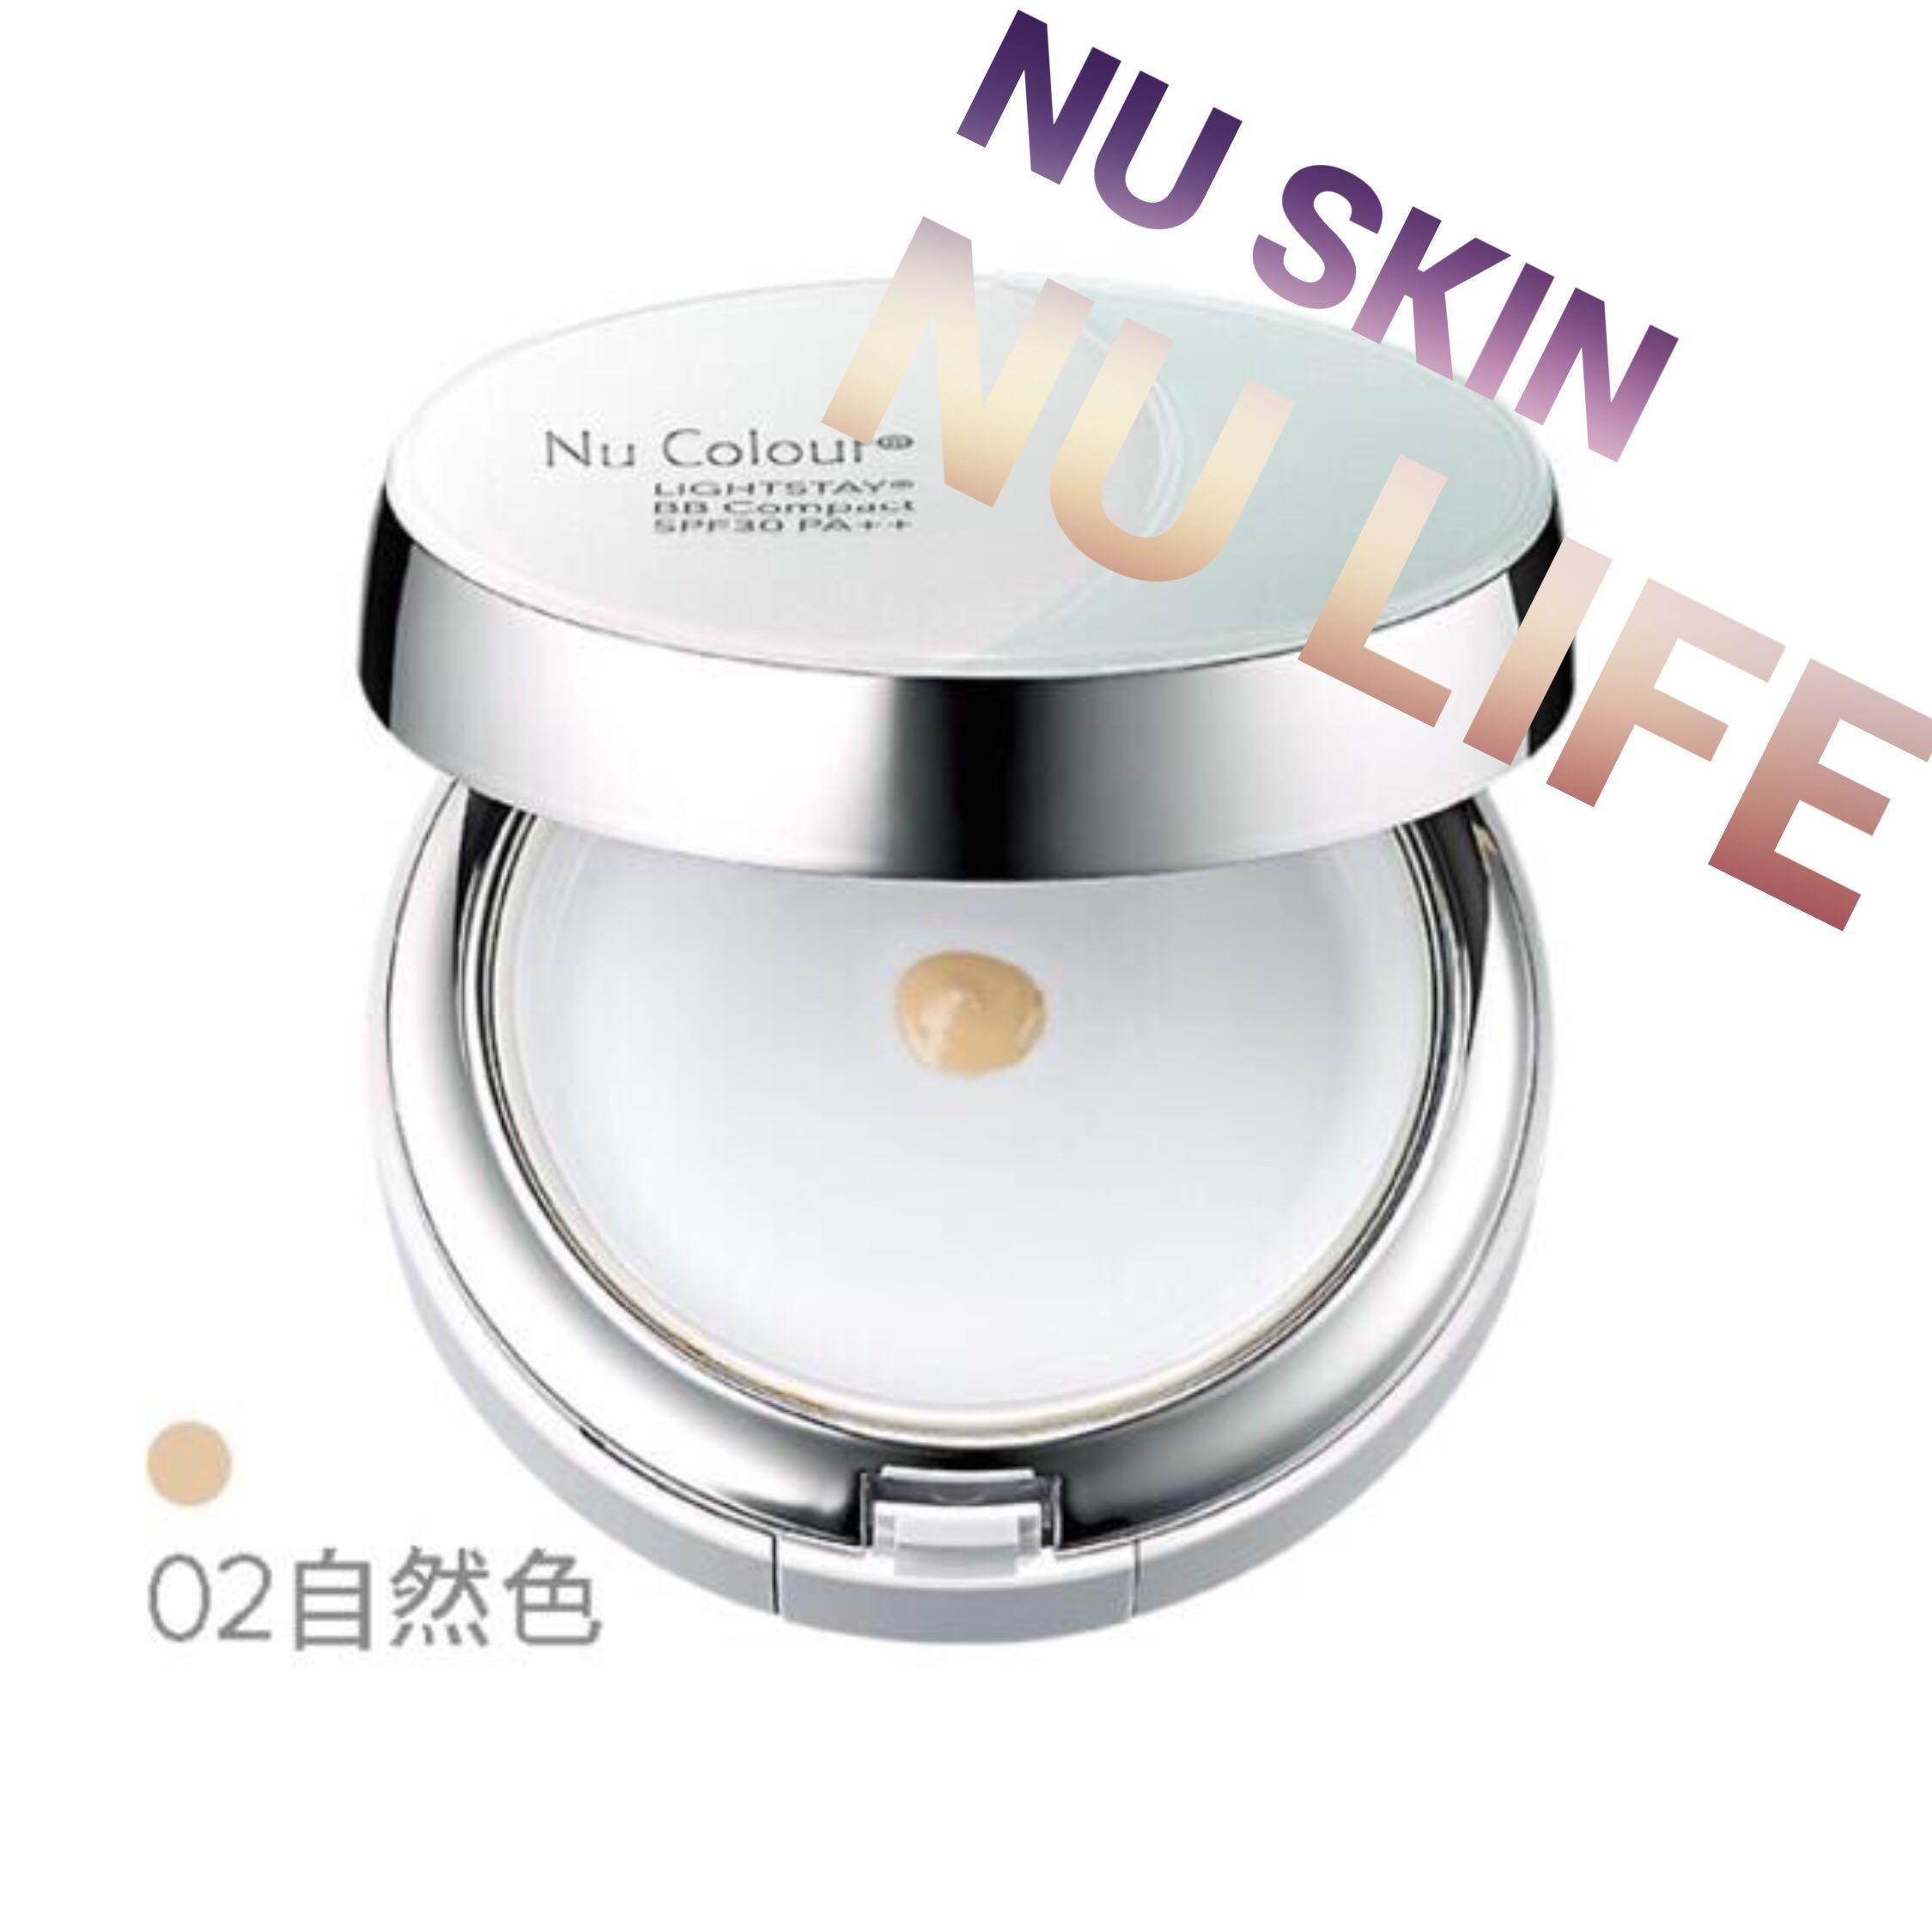 亮澤持久BB粉底SPF30PA++(2色)Nu skin 如新 Nu Color 彩妝系列